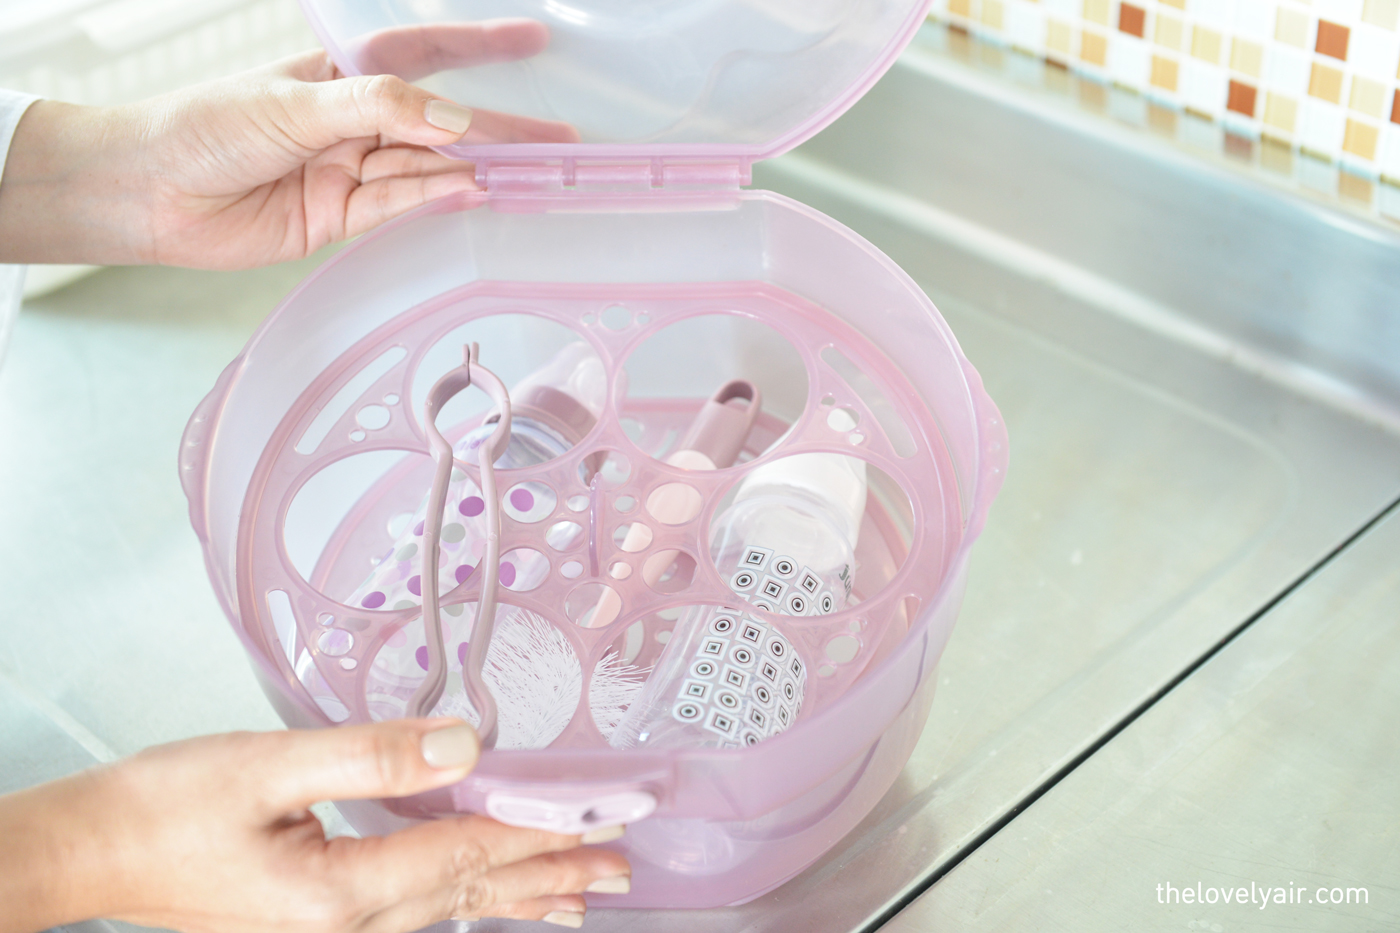 juniors-microwave-steam-steriliser-babyshop-2